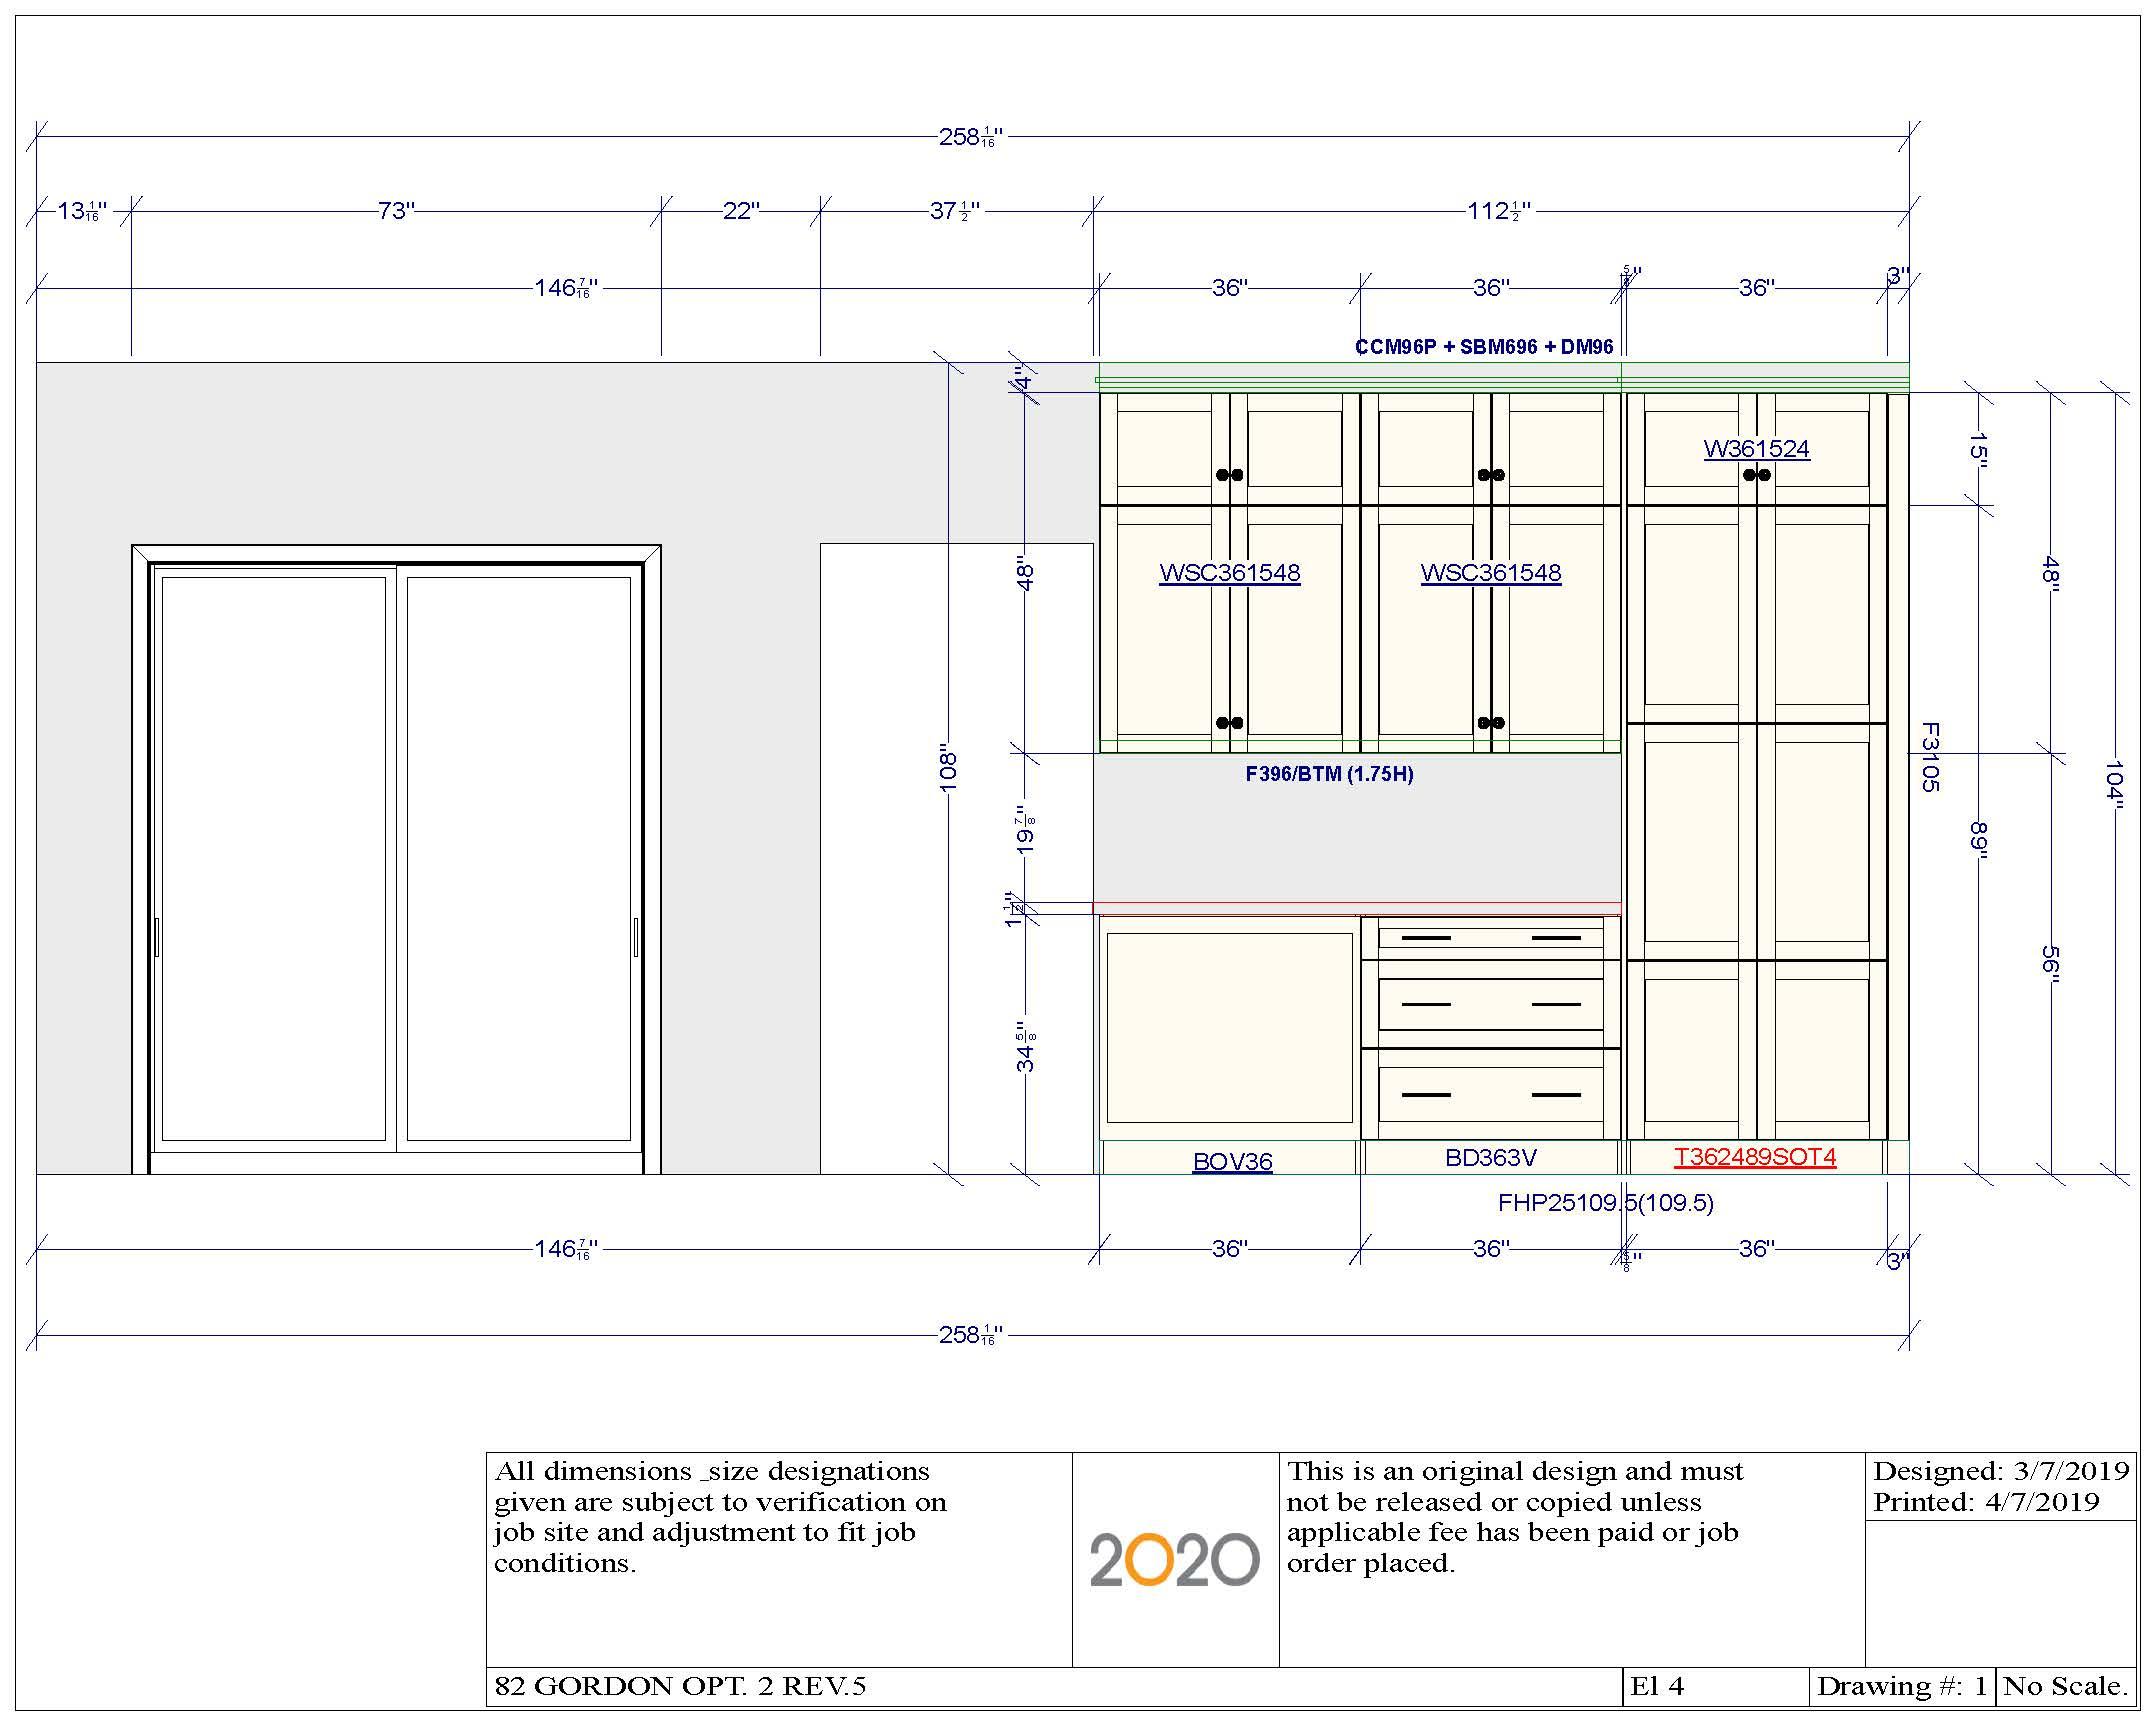 82 GORDON OPT. 2 REV.5-11_Page_11